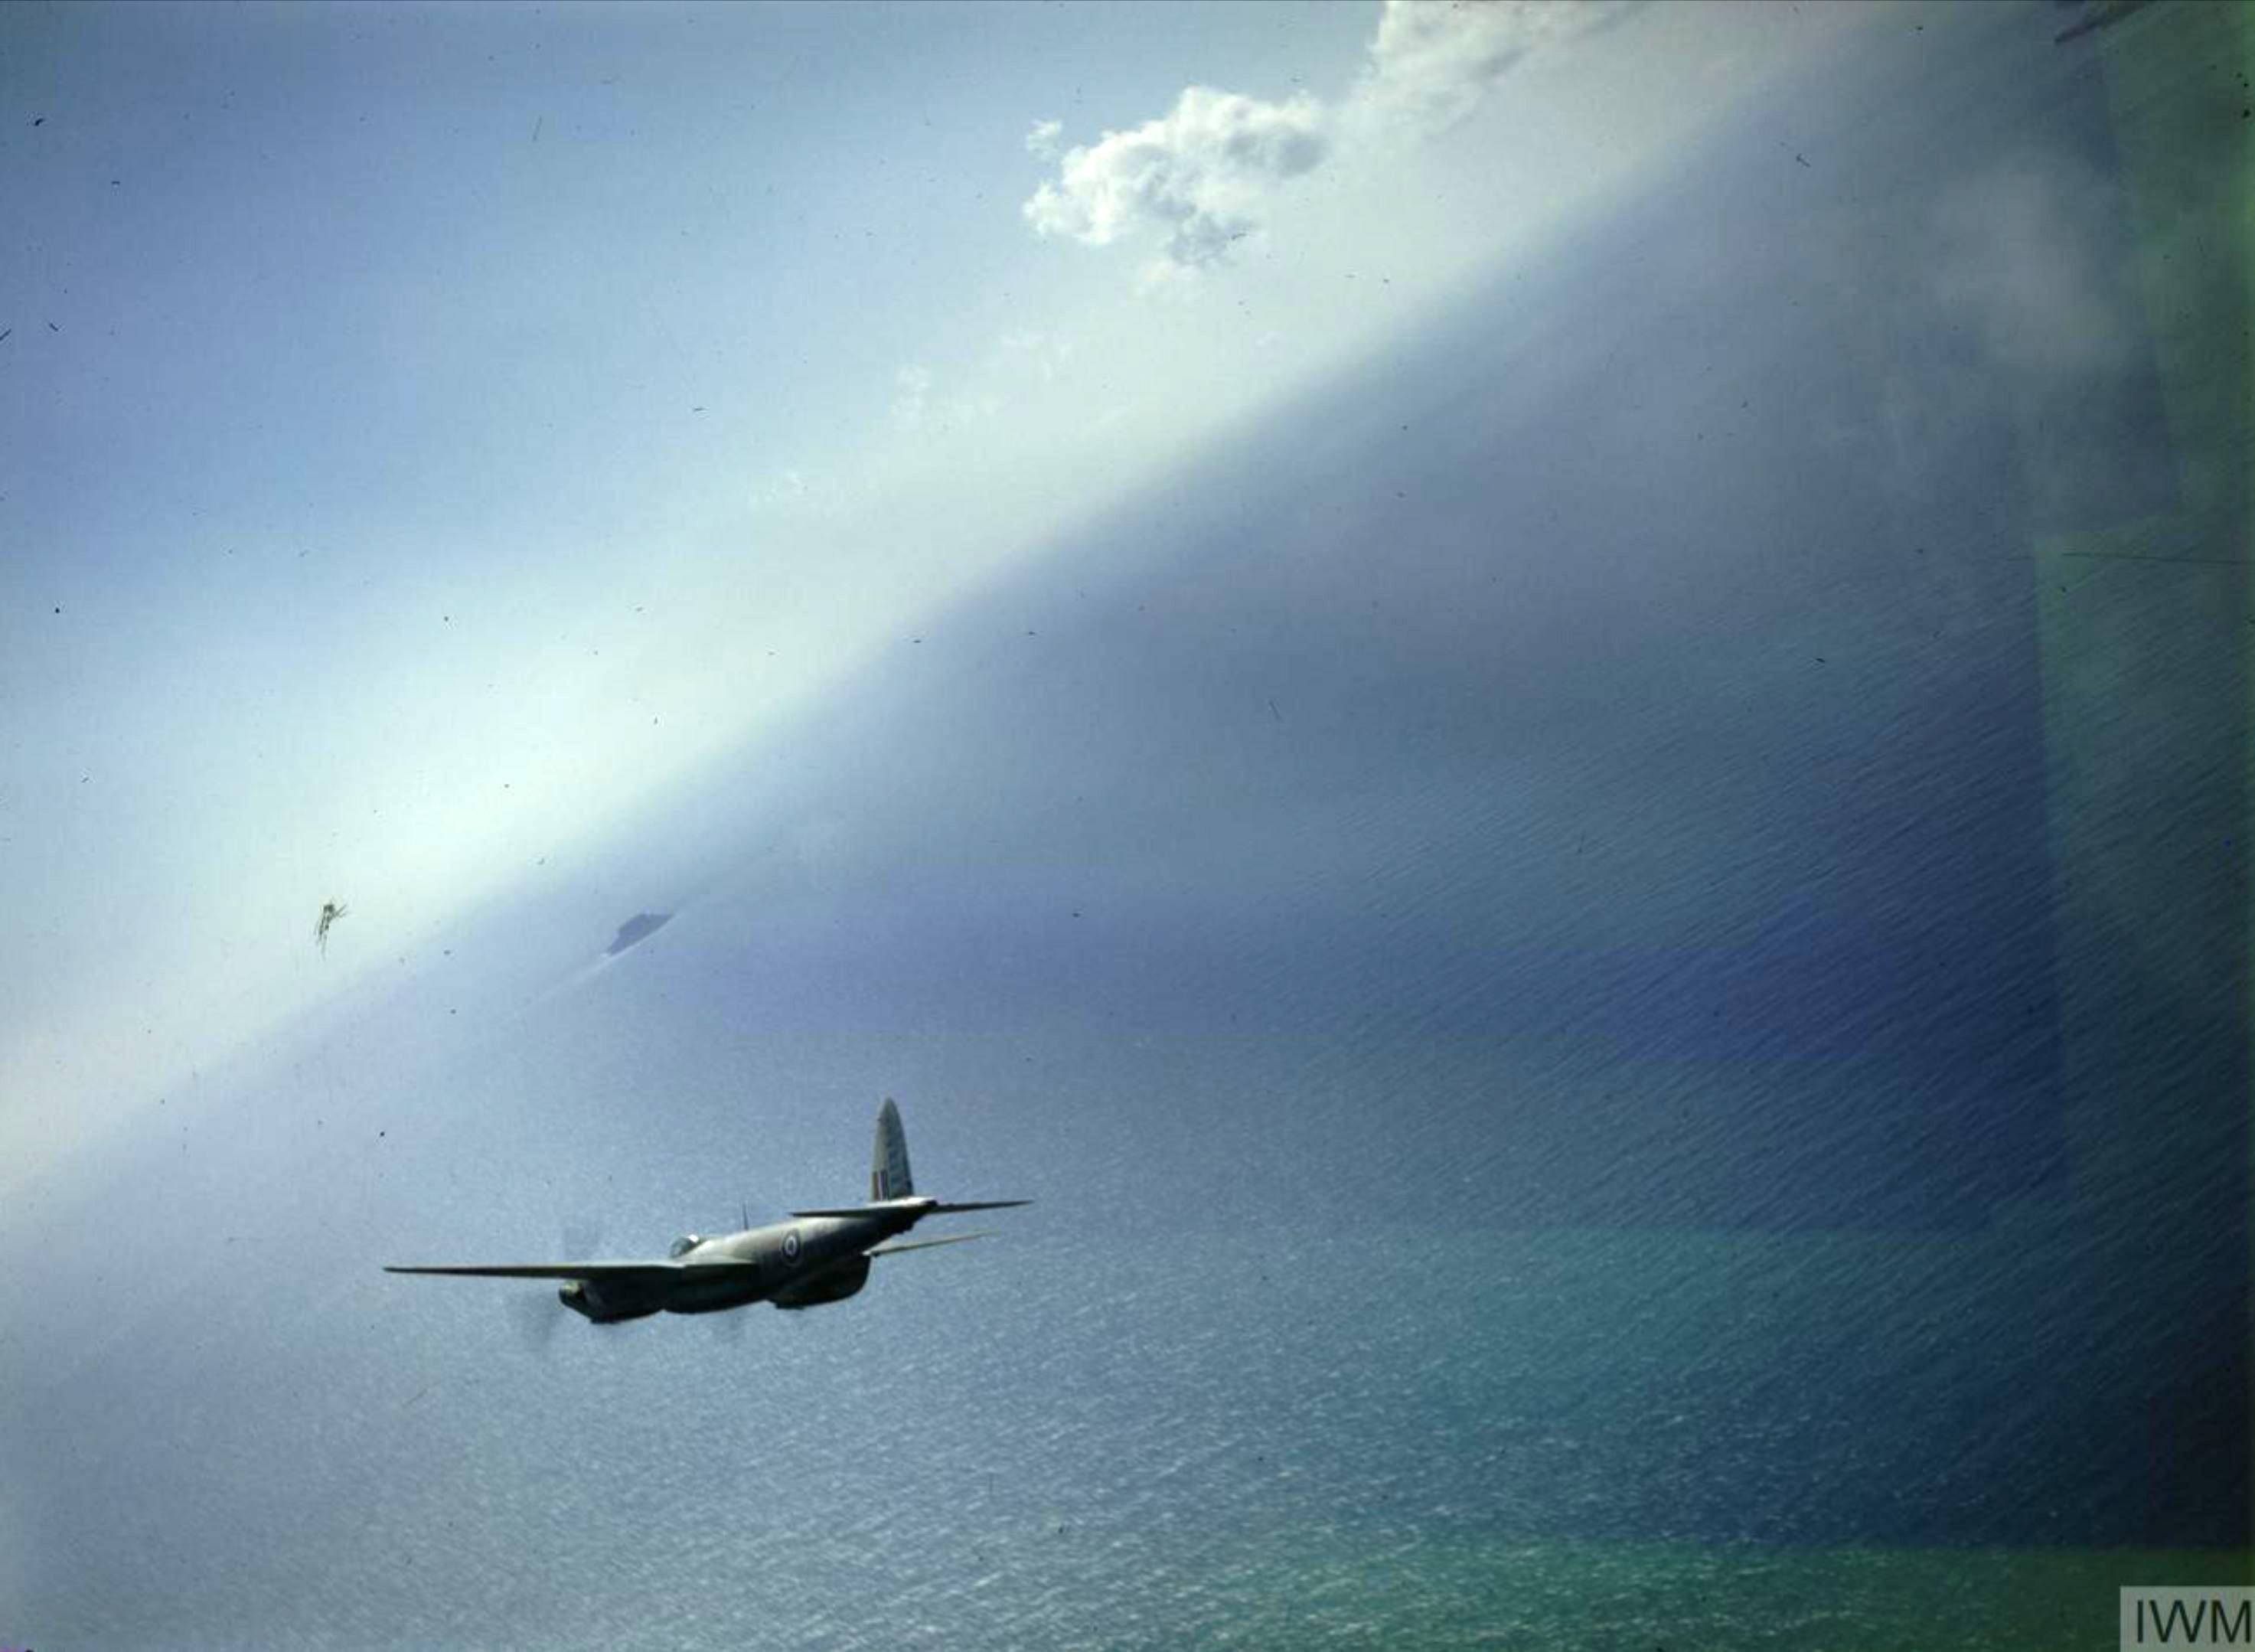 Mosquito II RAF 23Sqn YPR DZ231 over Malta Jun 1943 IWM TR1070